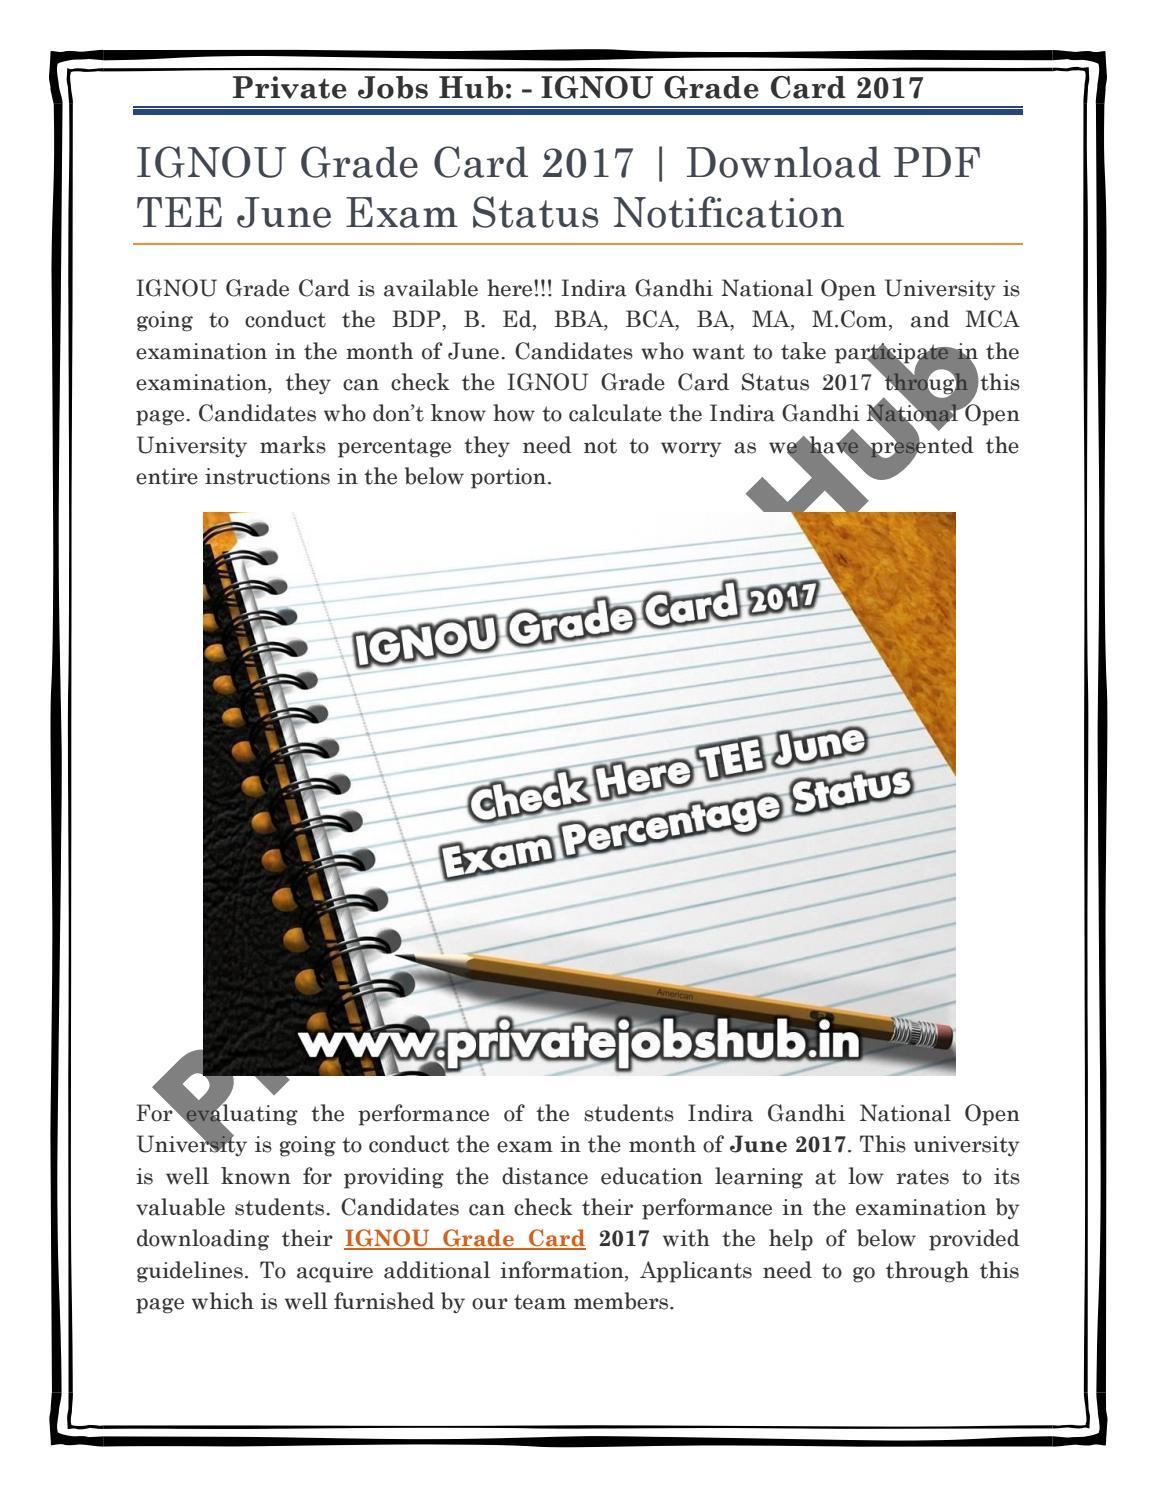 IGNOU Grade Card 2017 | Download PDF TEE June Exam Status Notification